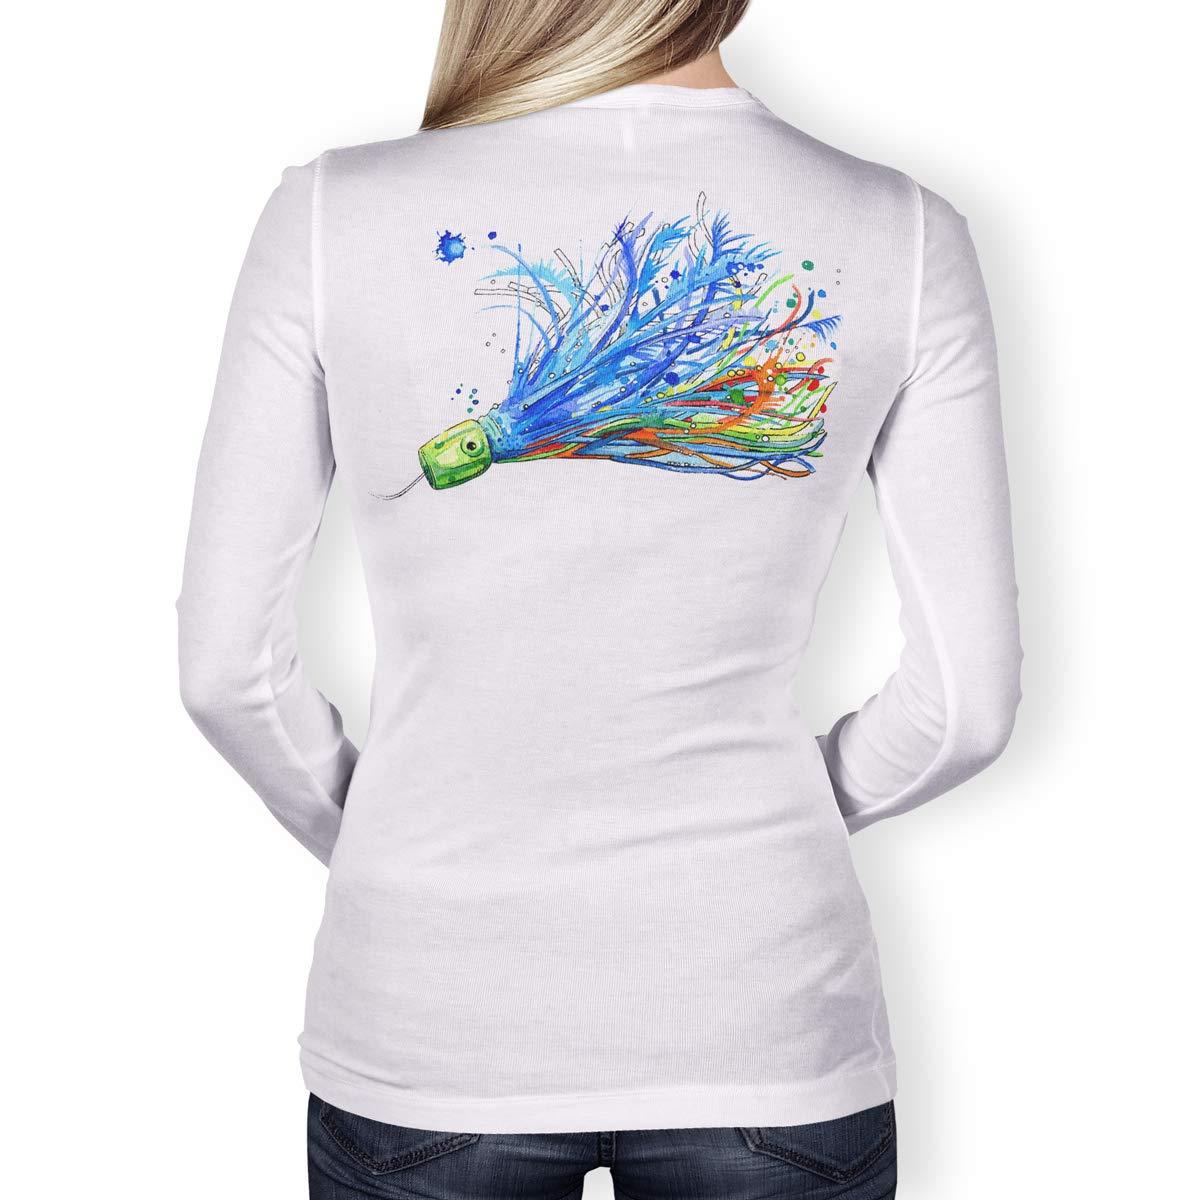 Amazon Southern Fin Apparel Womens Performance Fishing Shirt